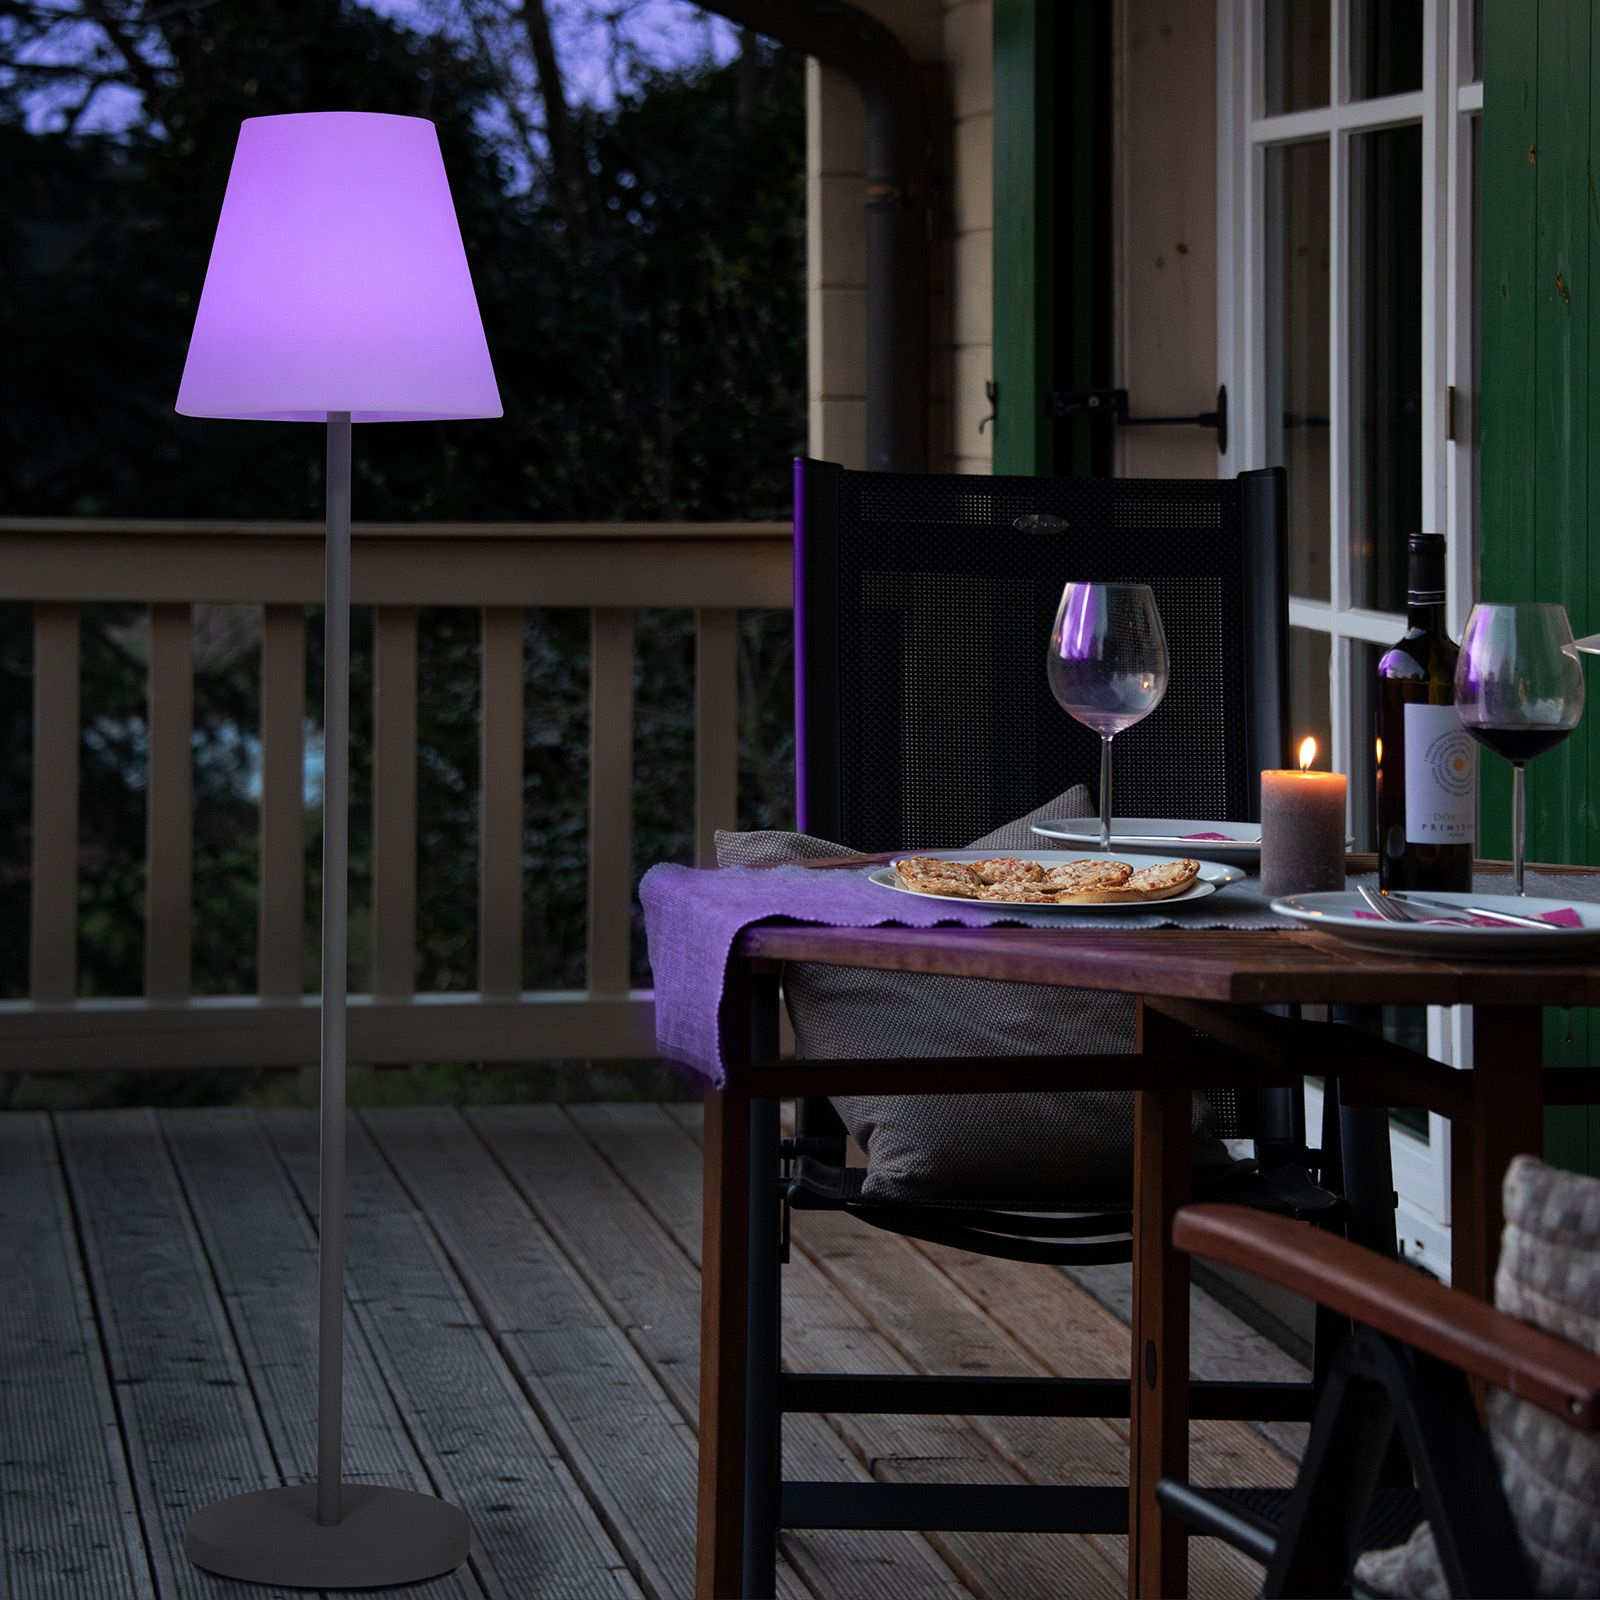 Menorca LED-gulvlampe, solcelle, farveskift, IP44